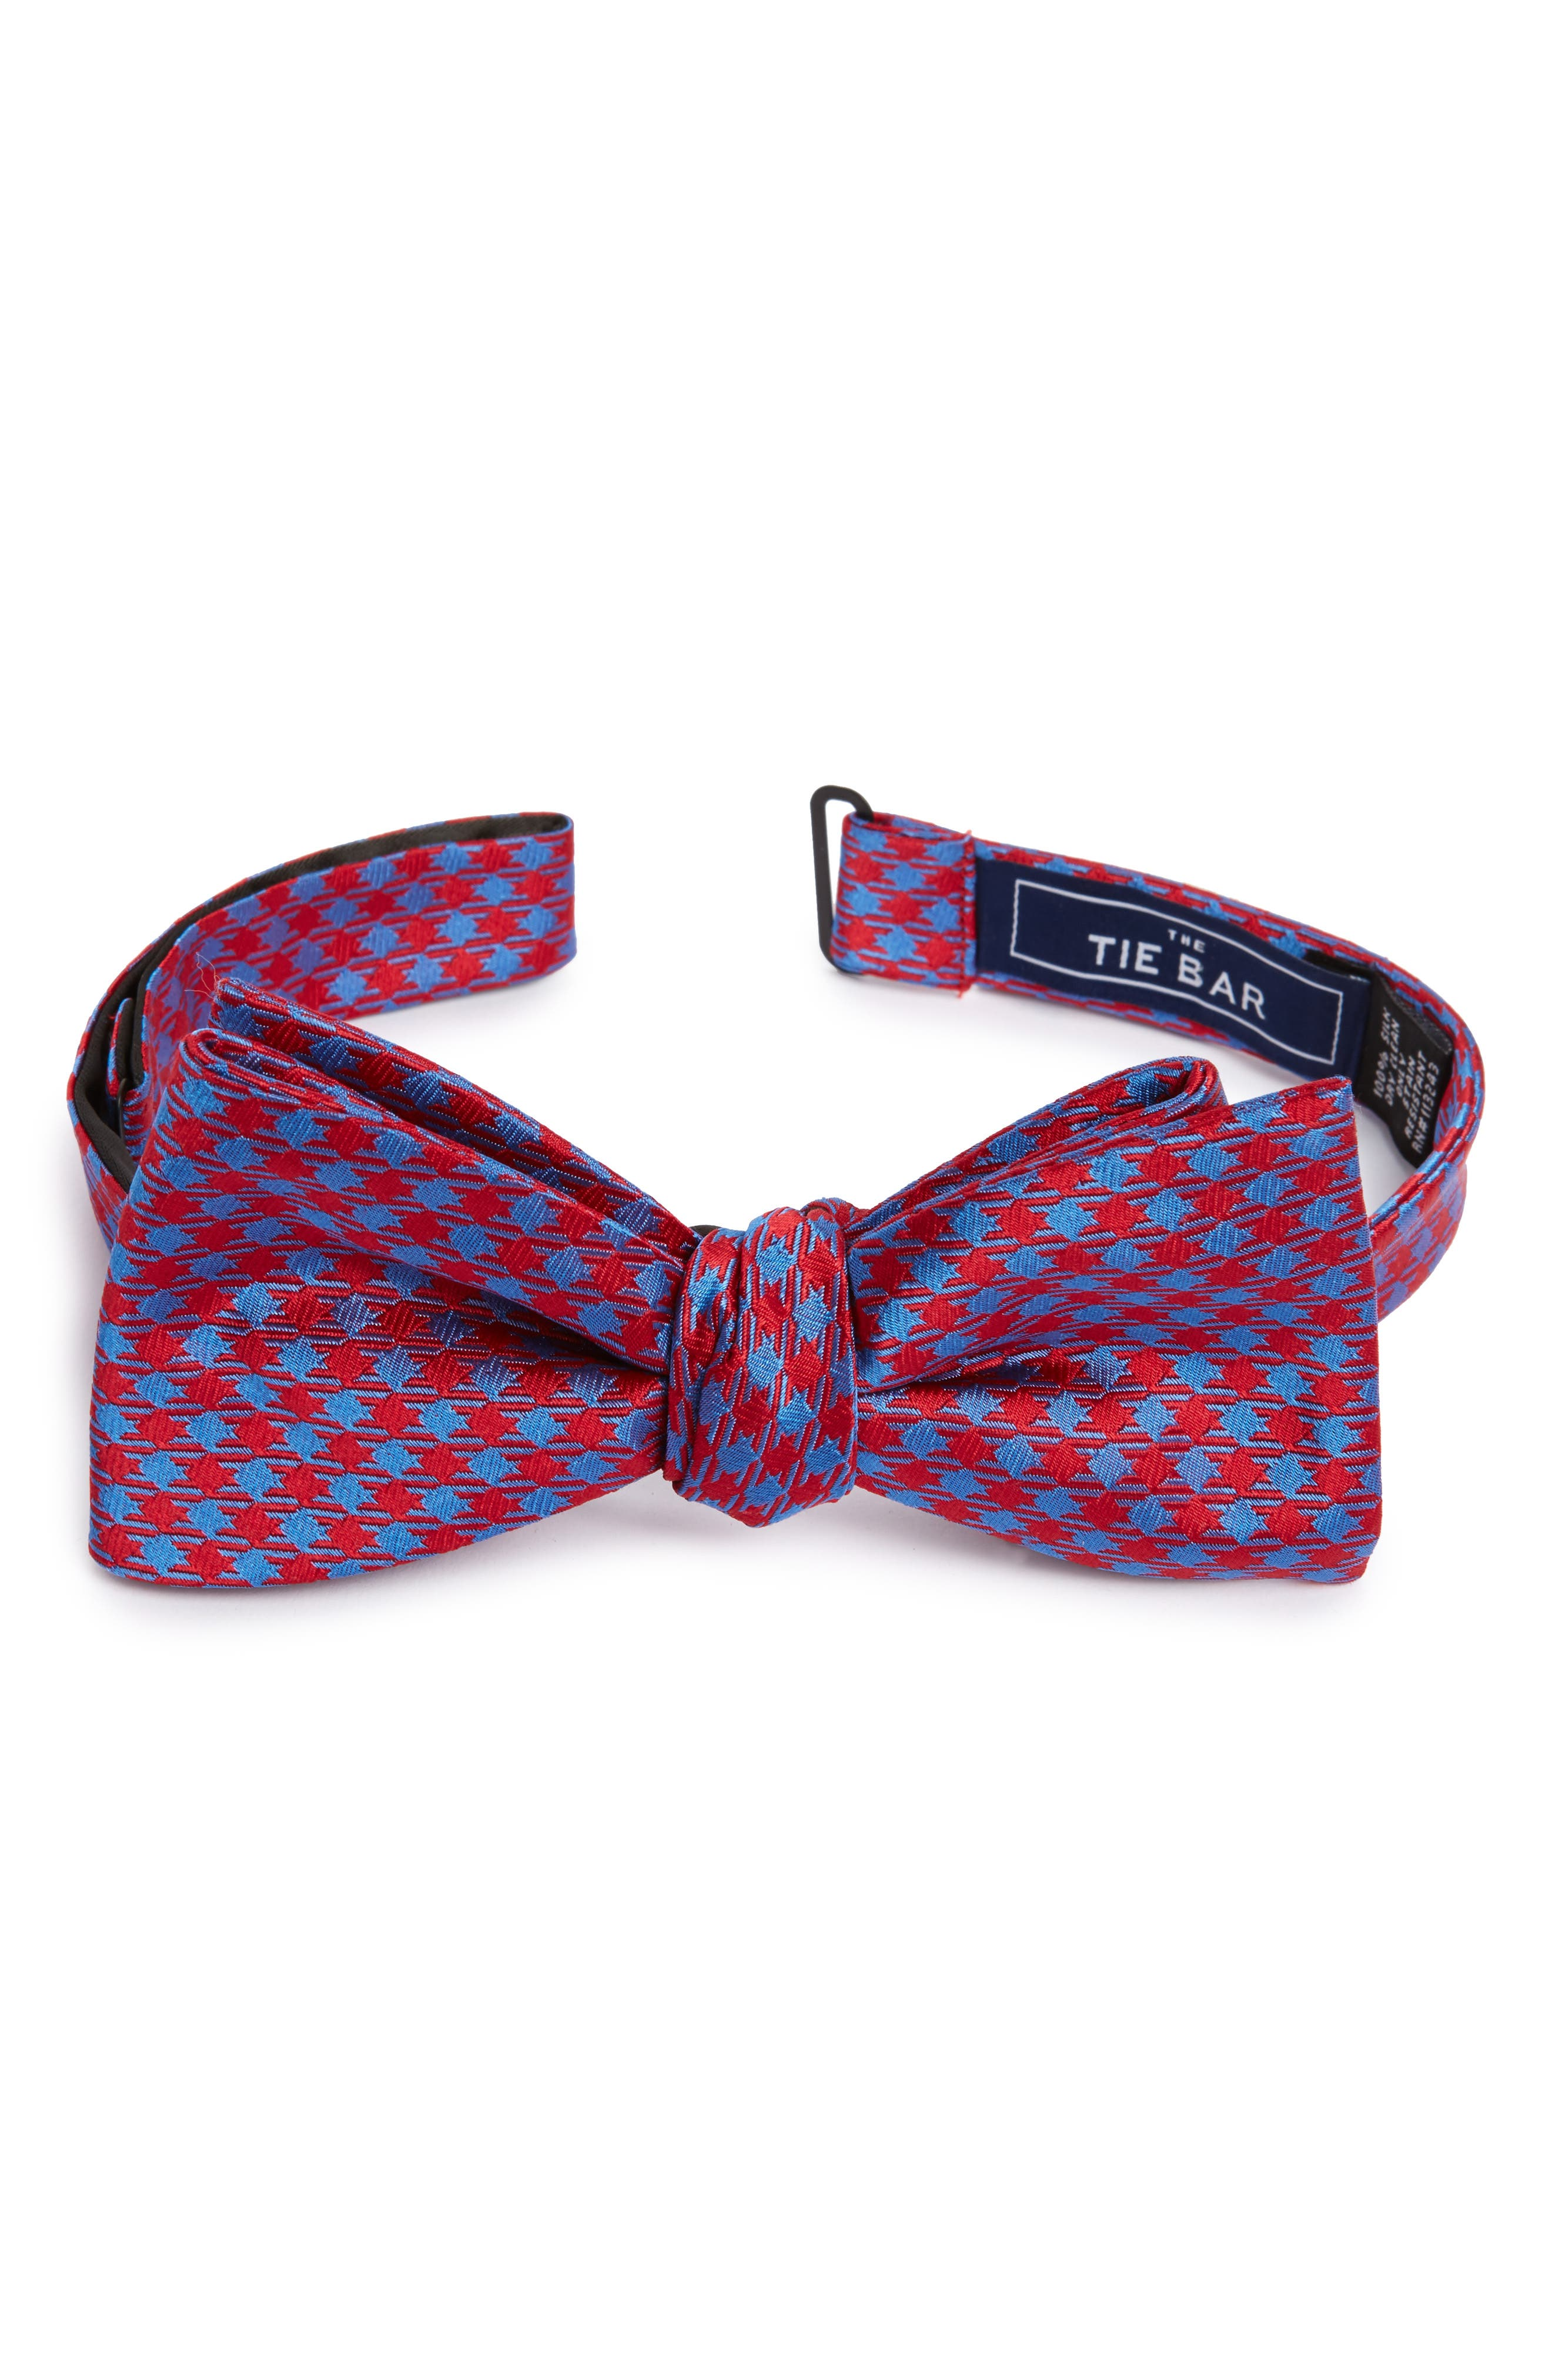 Commix Check Silk Bow Tie,                             Main thumbnail 1, color,                             600